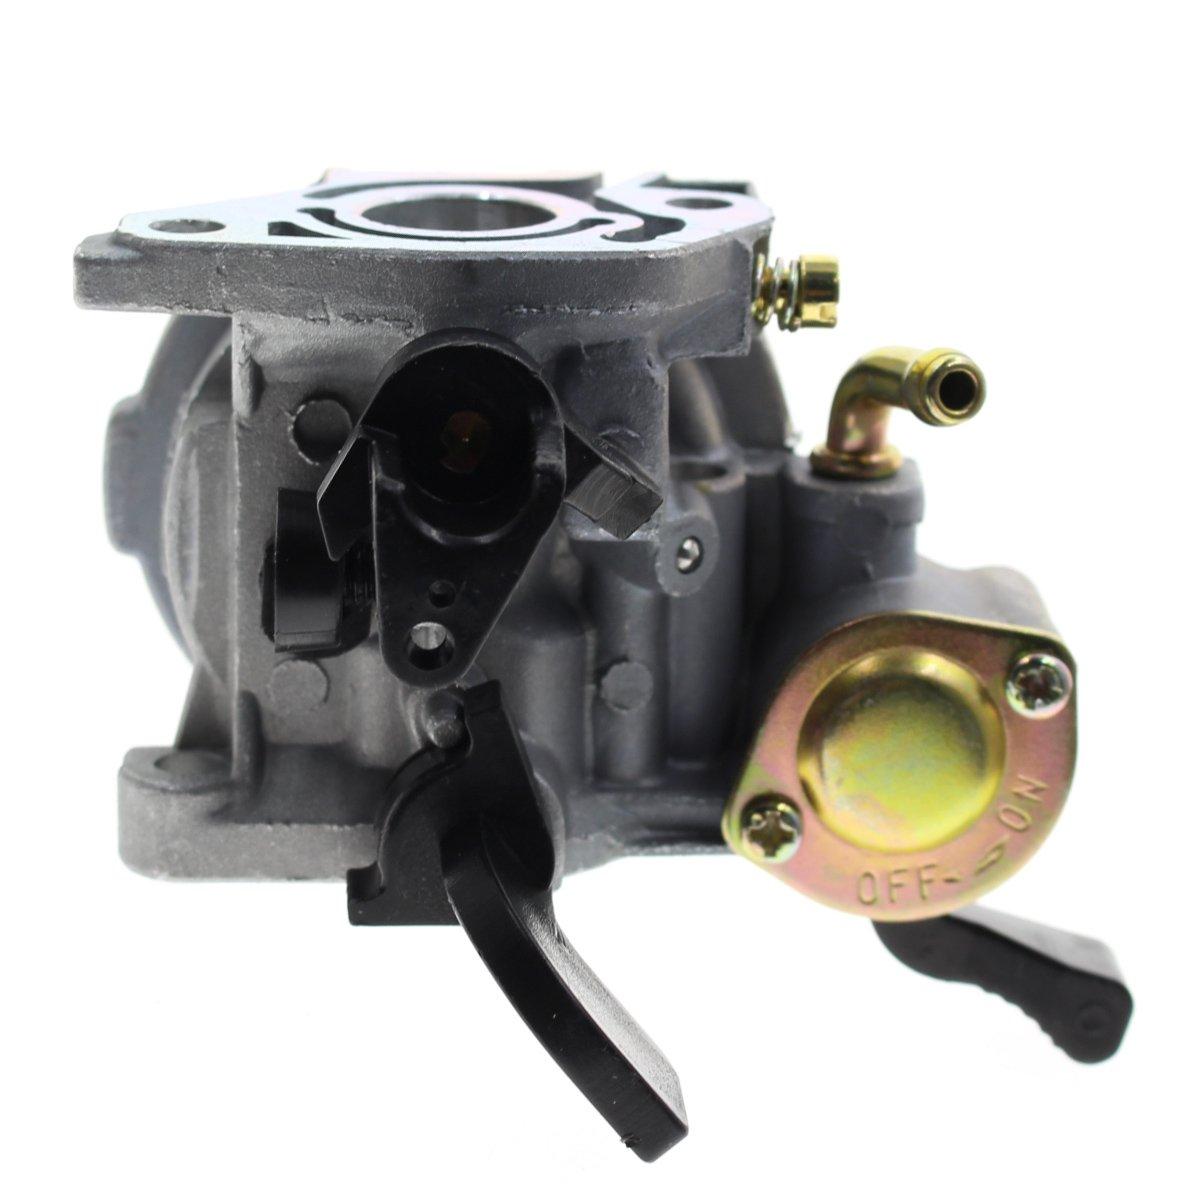 Carbhhub Carburetor for 97cc 2.8hp Mini Baja Doodlebug Doodle Bug Db30 Dirt Pit Mini Bike 3//5 Air Intake Carb with Gaskets